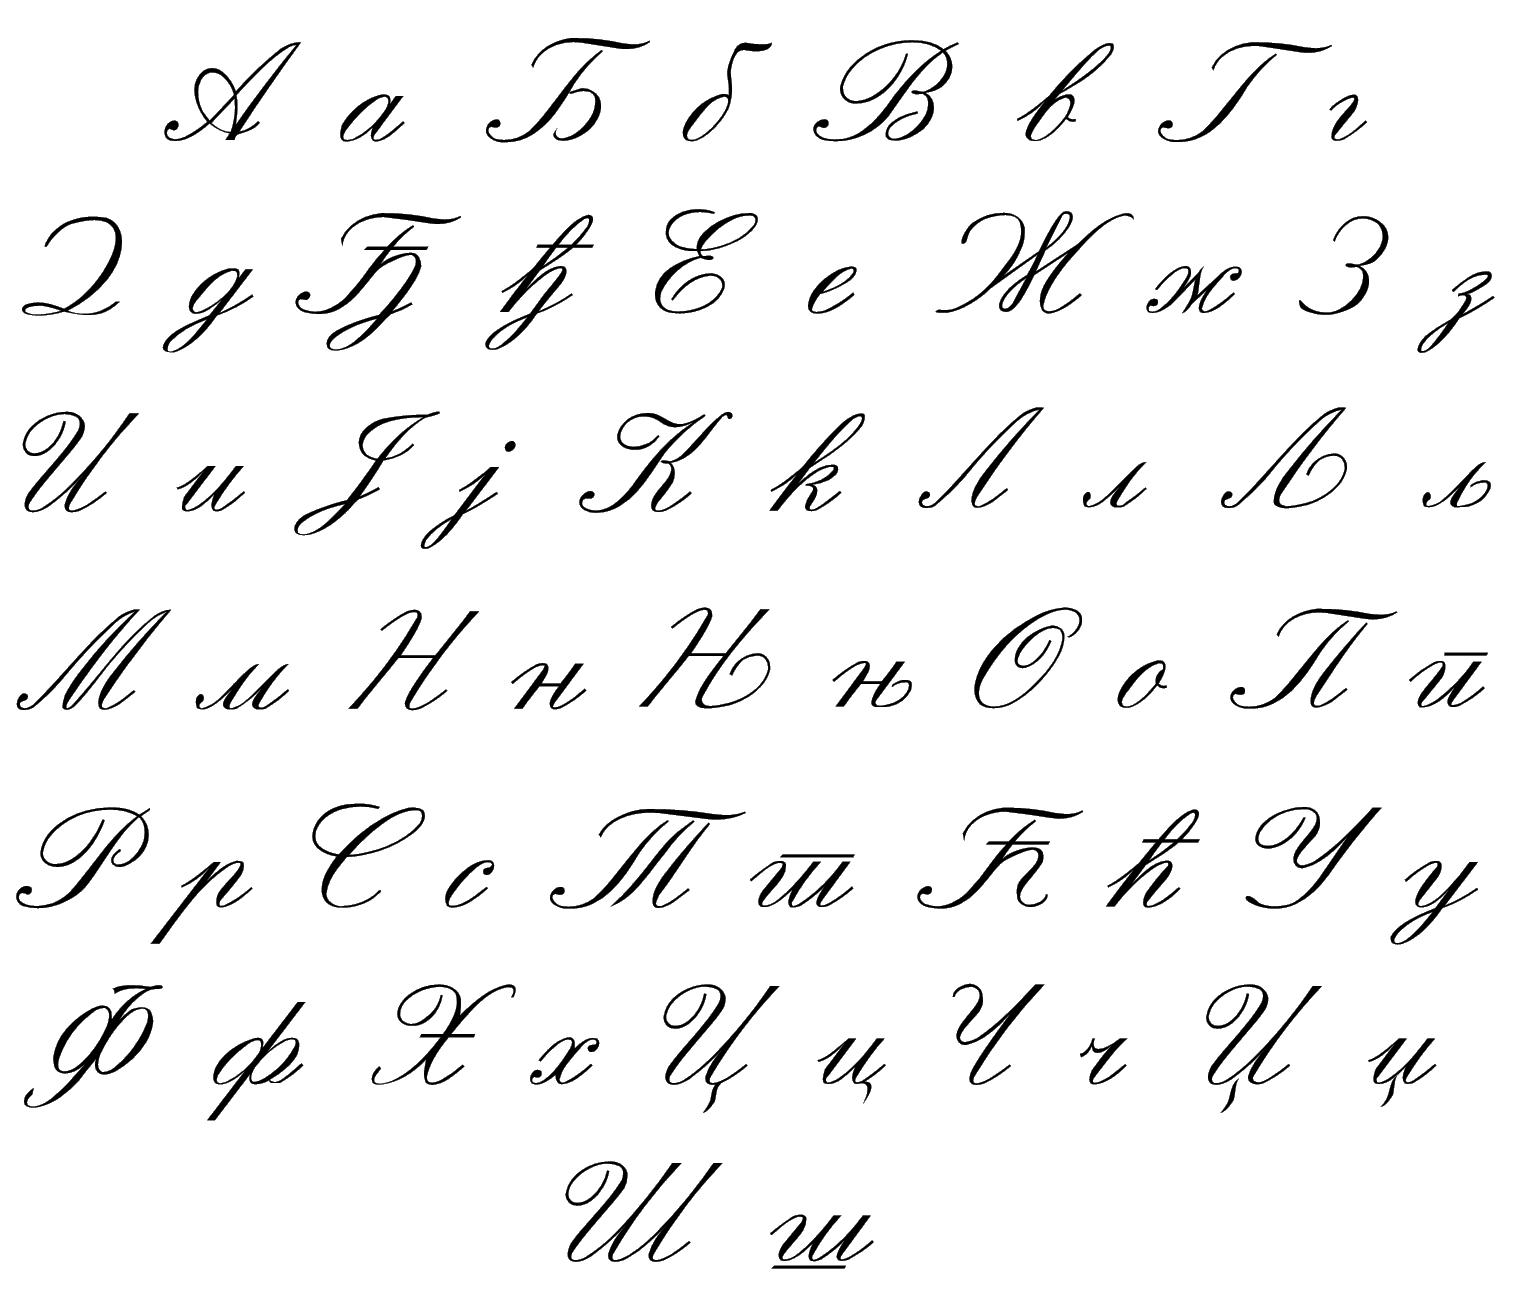 File:Serbian writing style around 1900, now partially